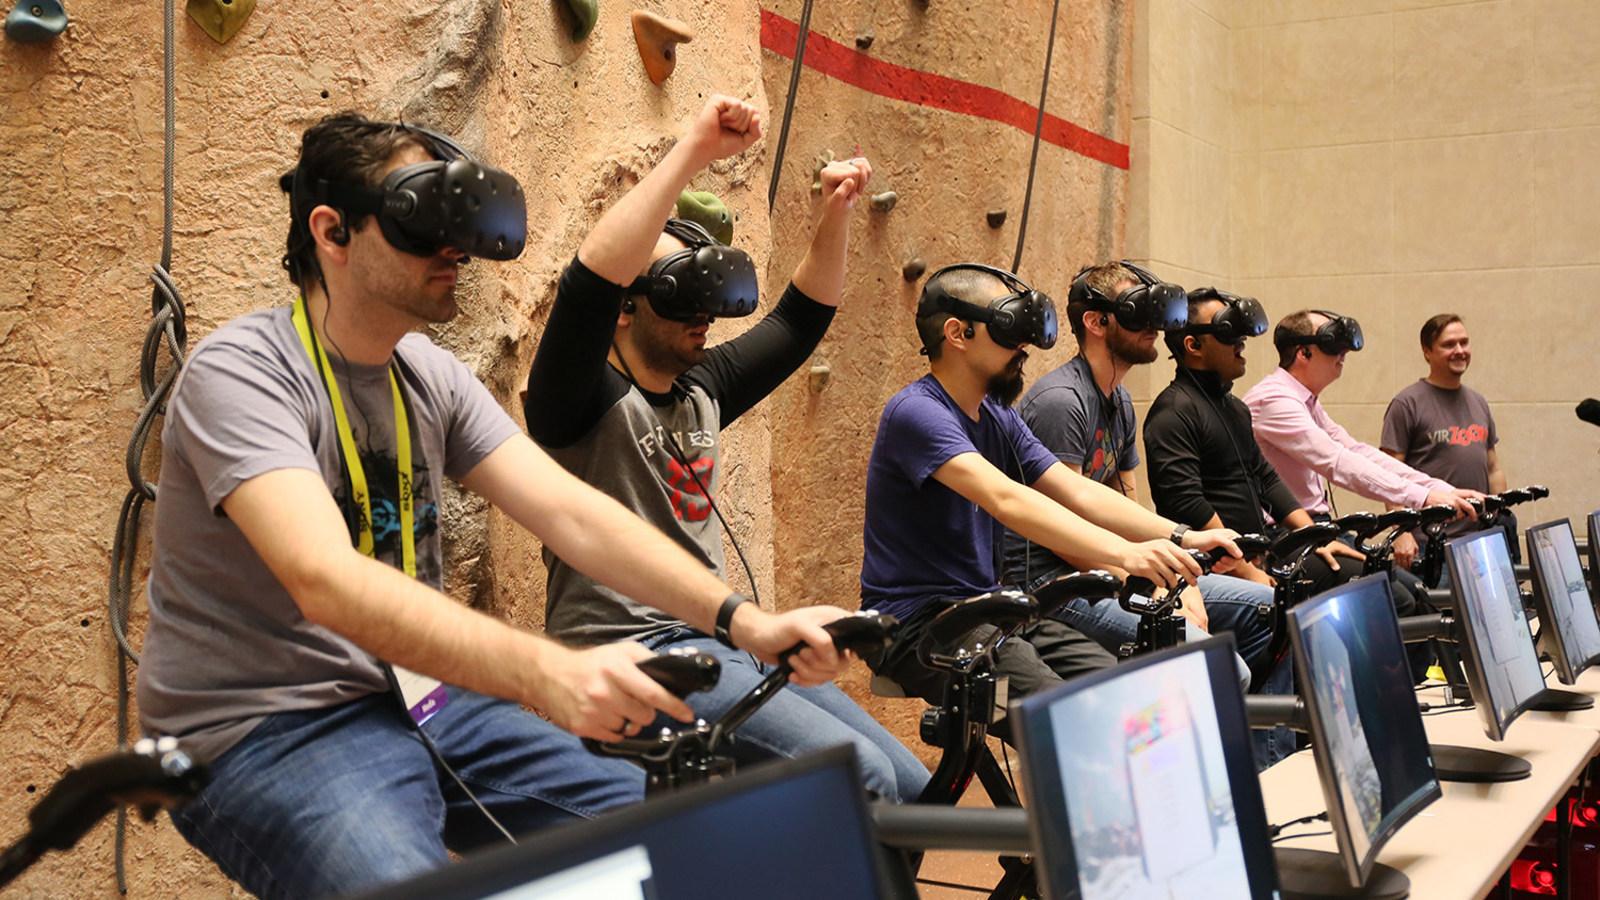 Ảnh: Road to VR